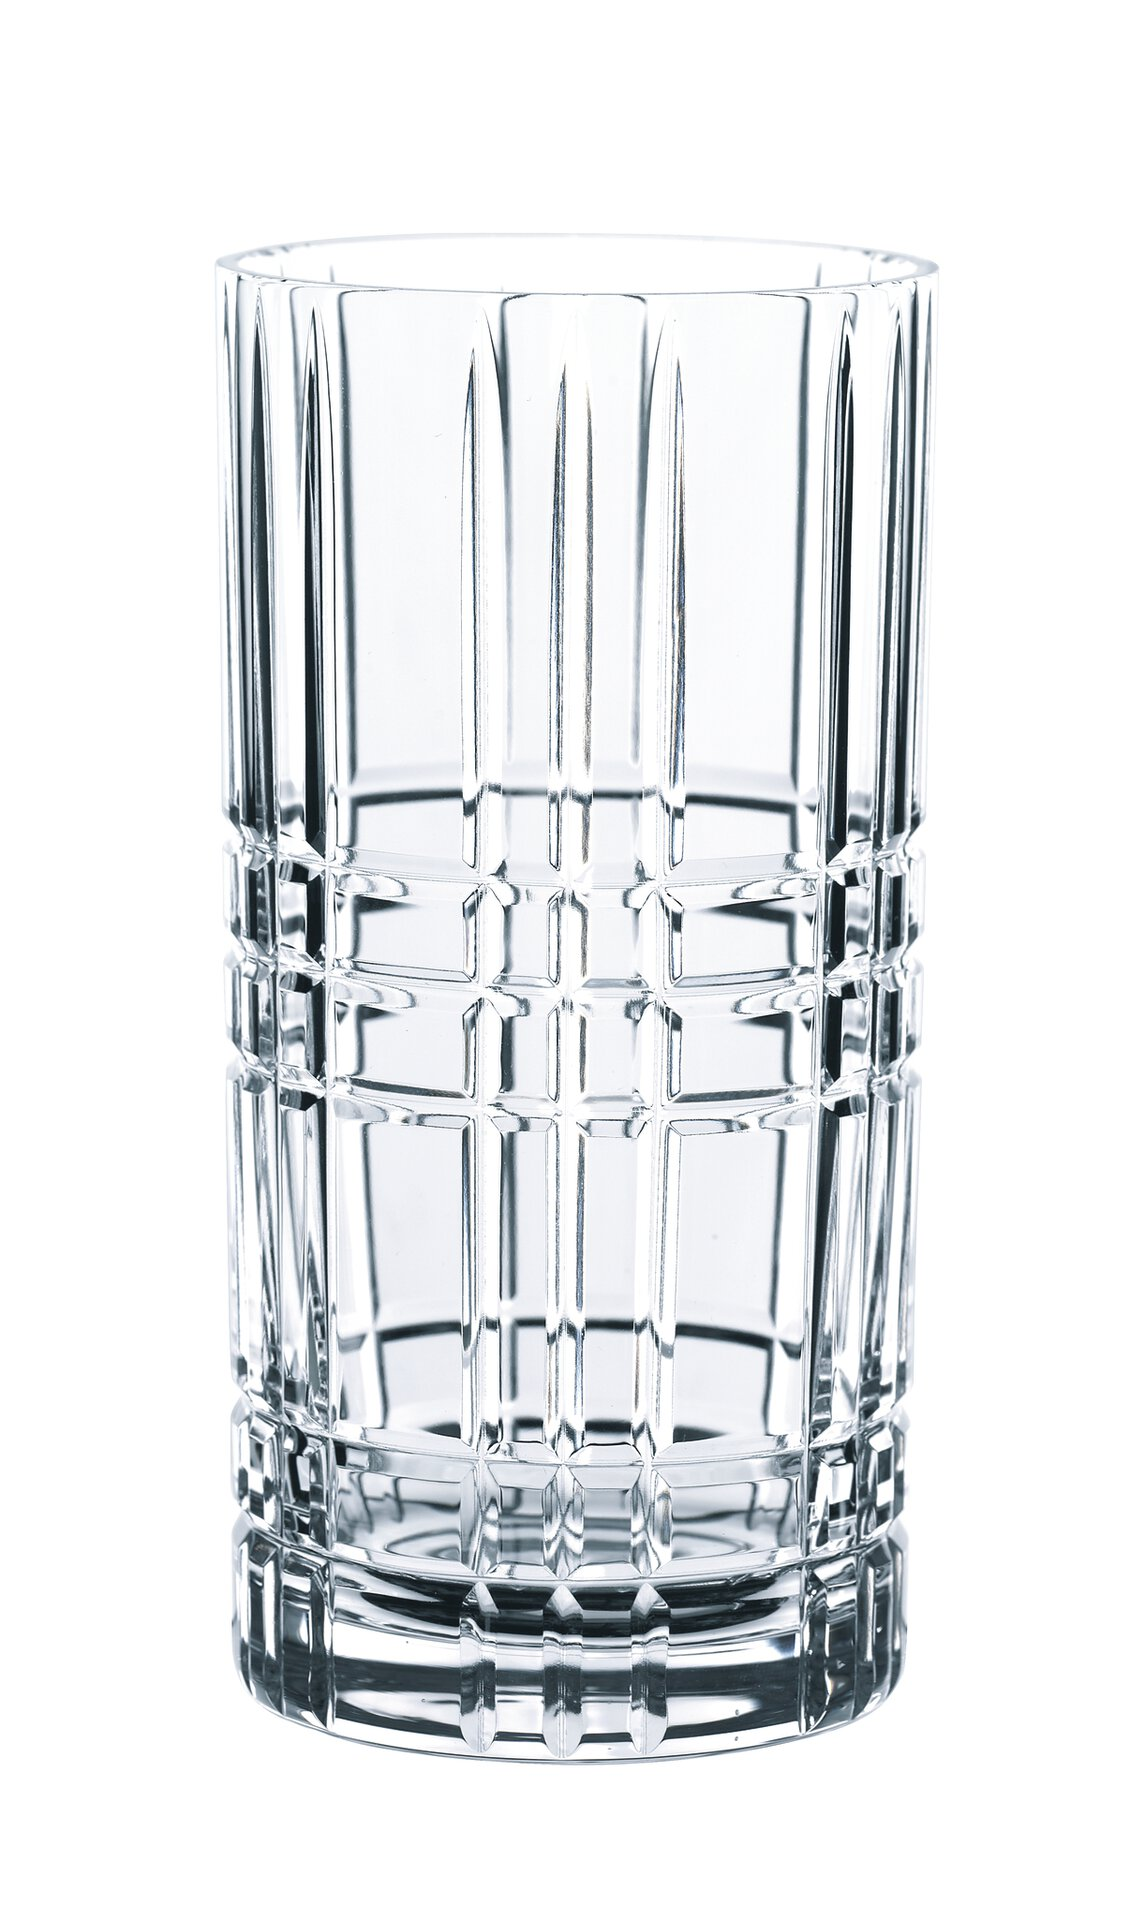 Aperitifglas Tastes Good Nachtmann Glas 8 x 15 x 8 cm